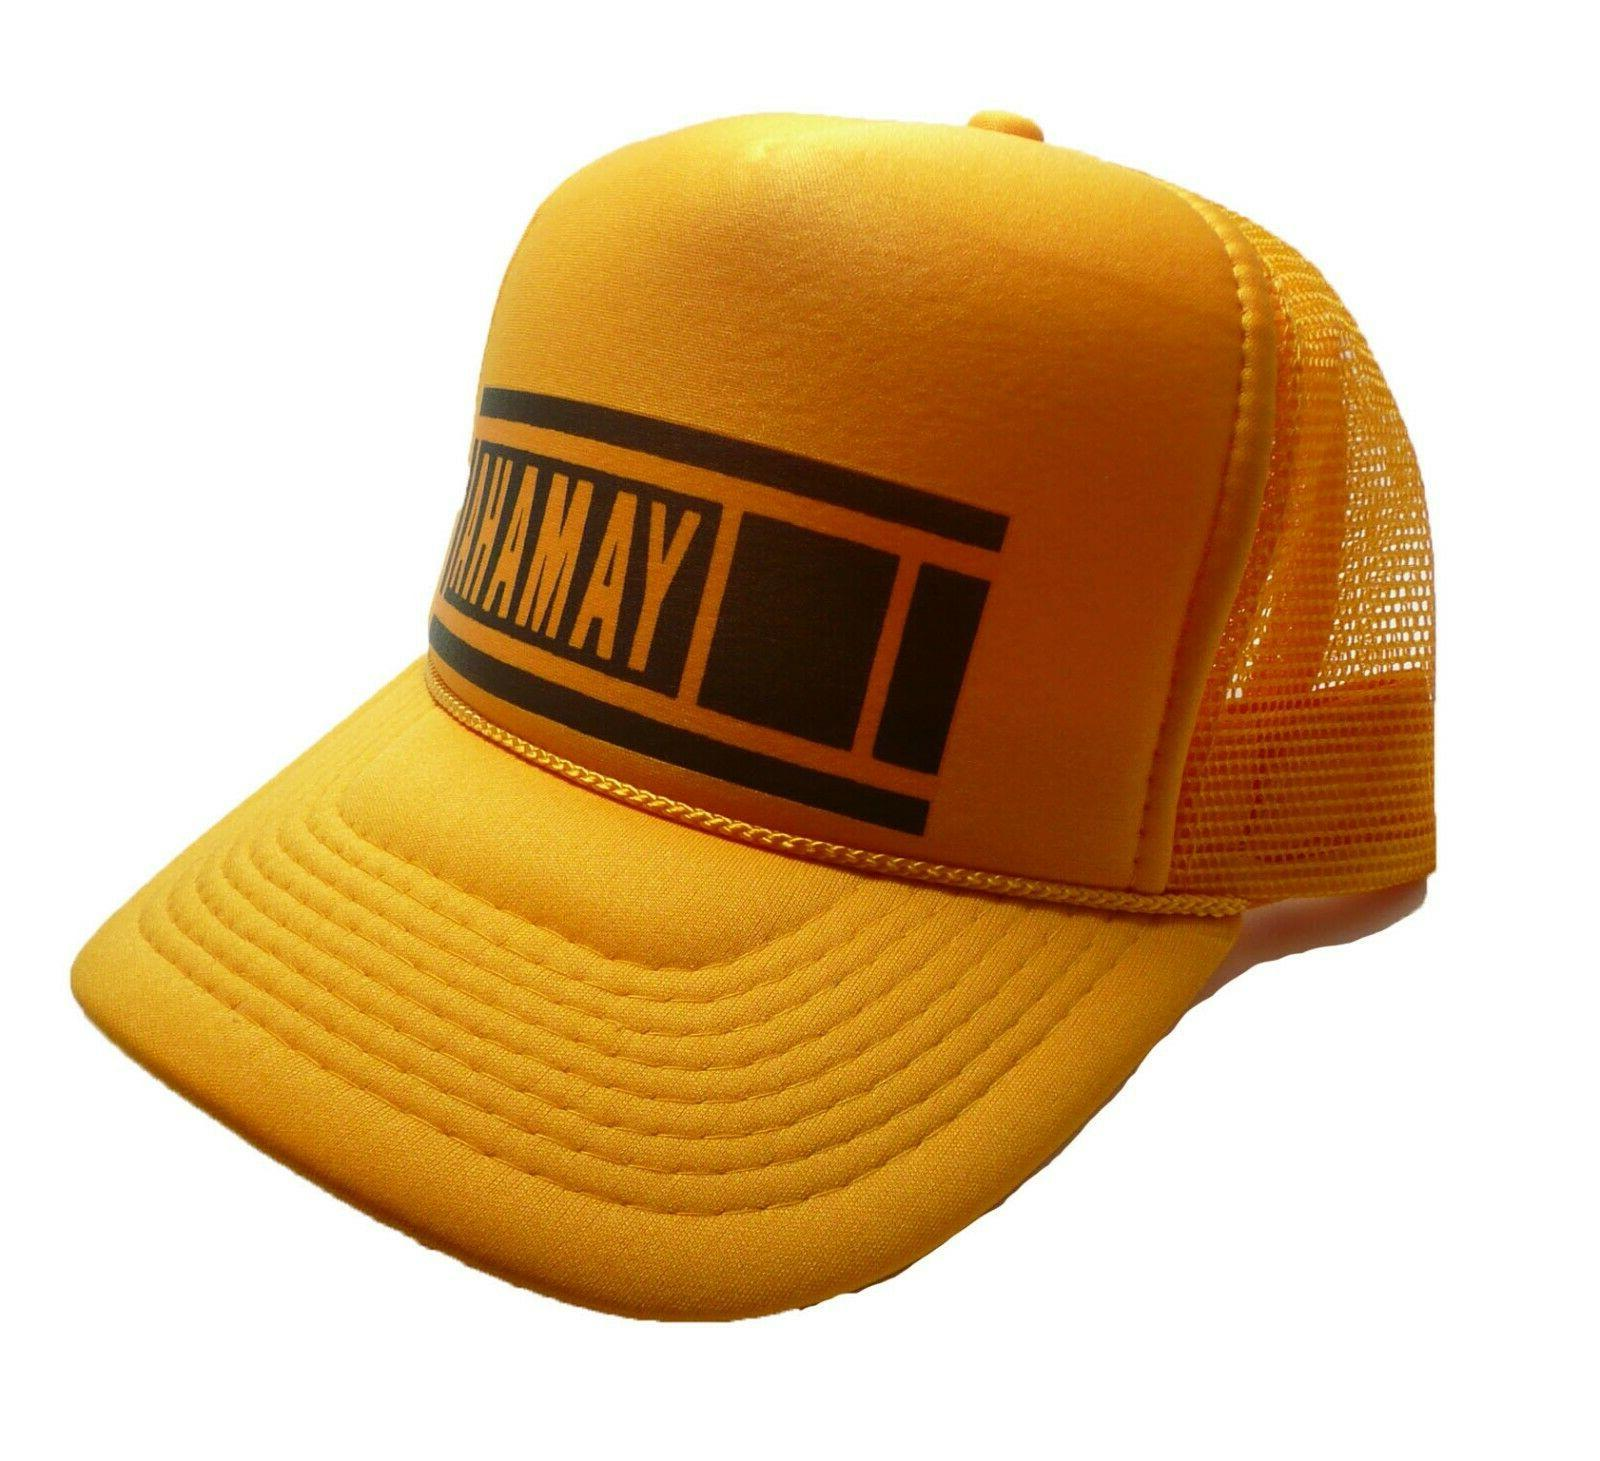 Vintage Yamaha 80's Trucker hat cap New